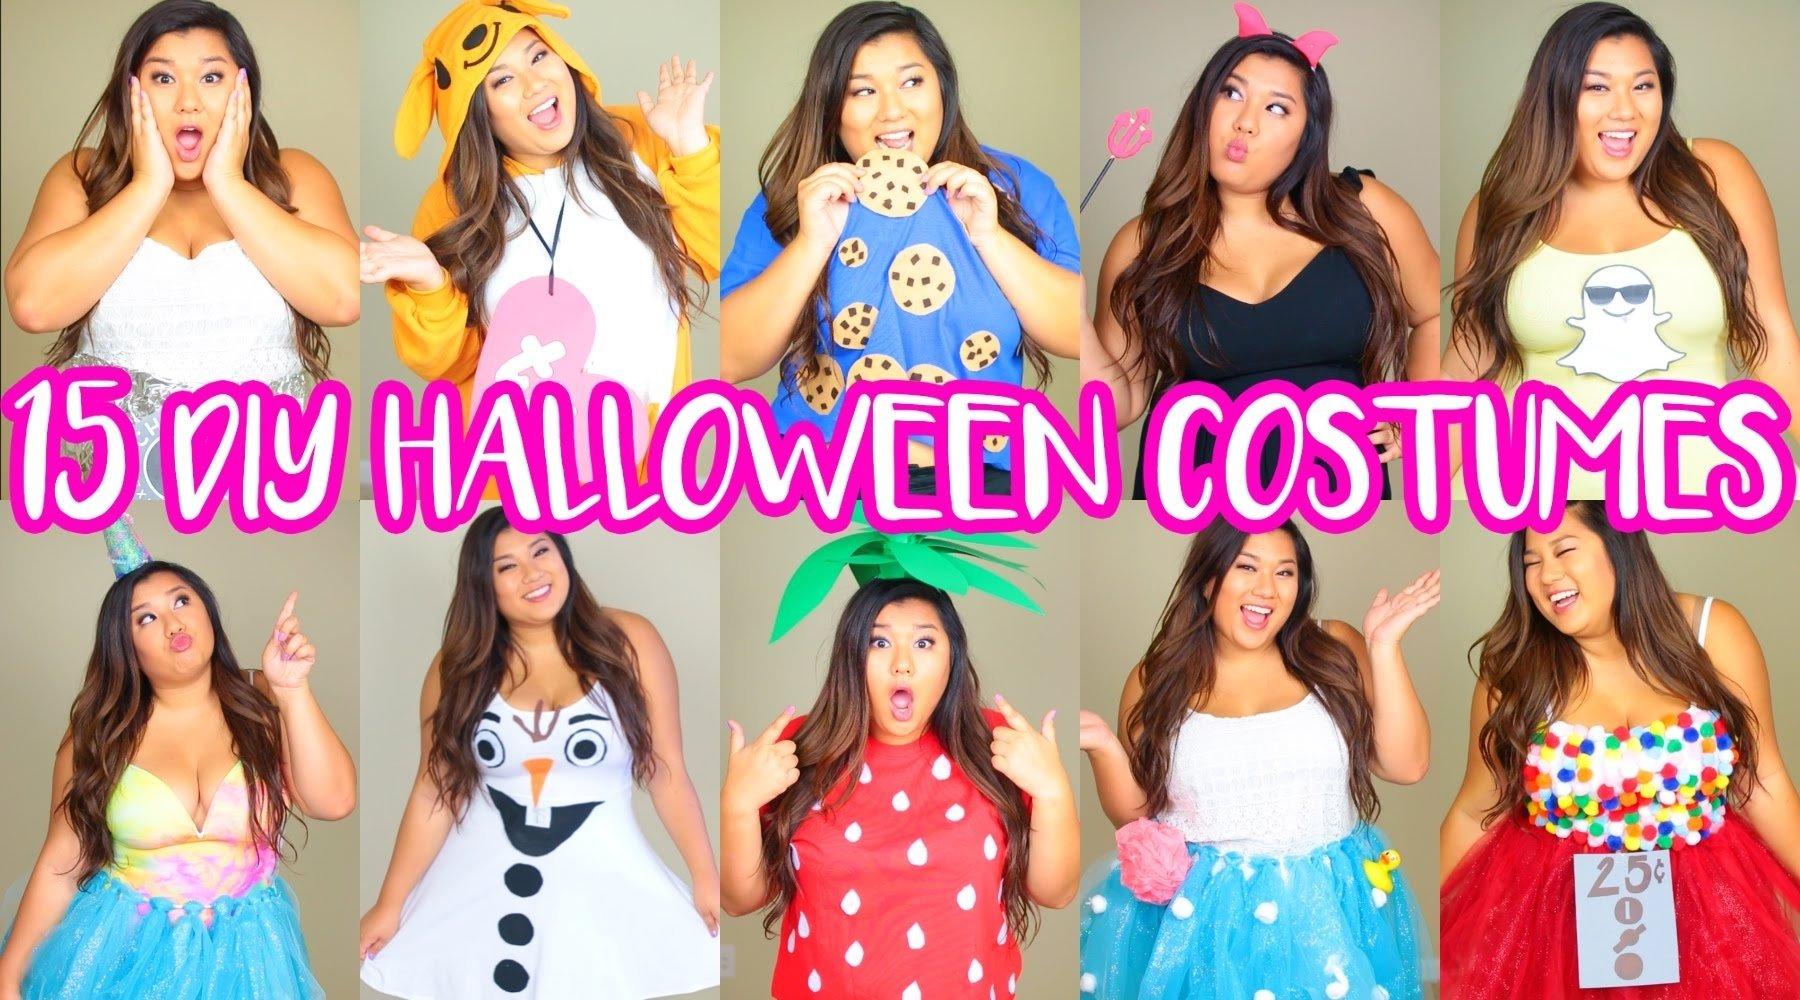 10 Unique Cute Halloween Costume Ideas For Girls 15 diy halloween costumes last minute cute easy youtube 4